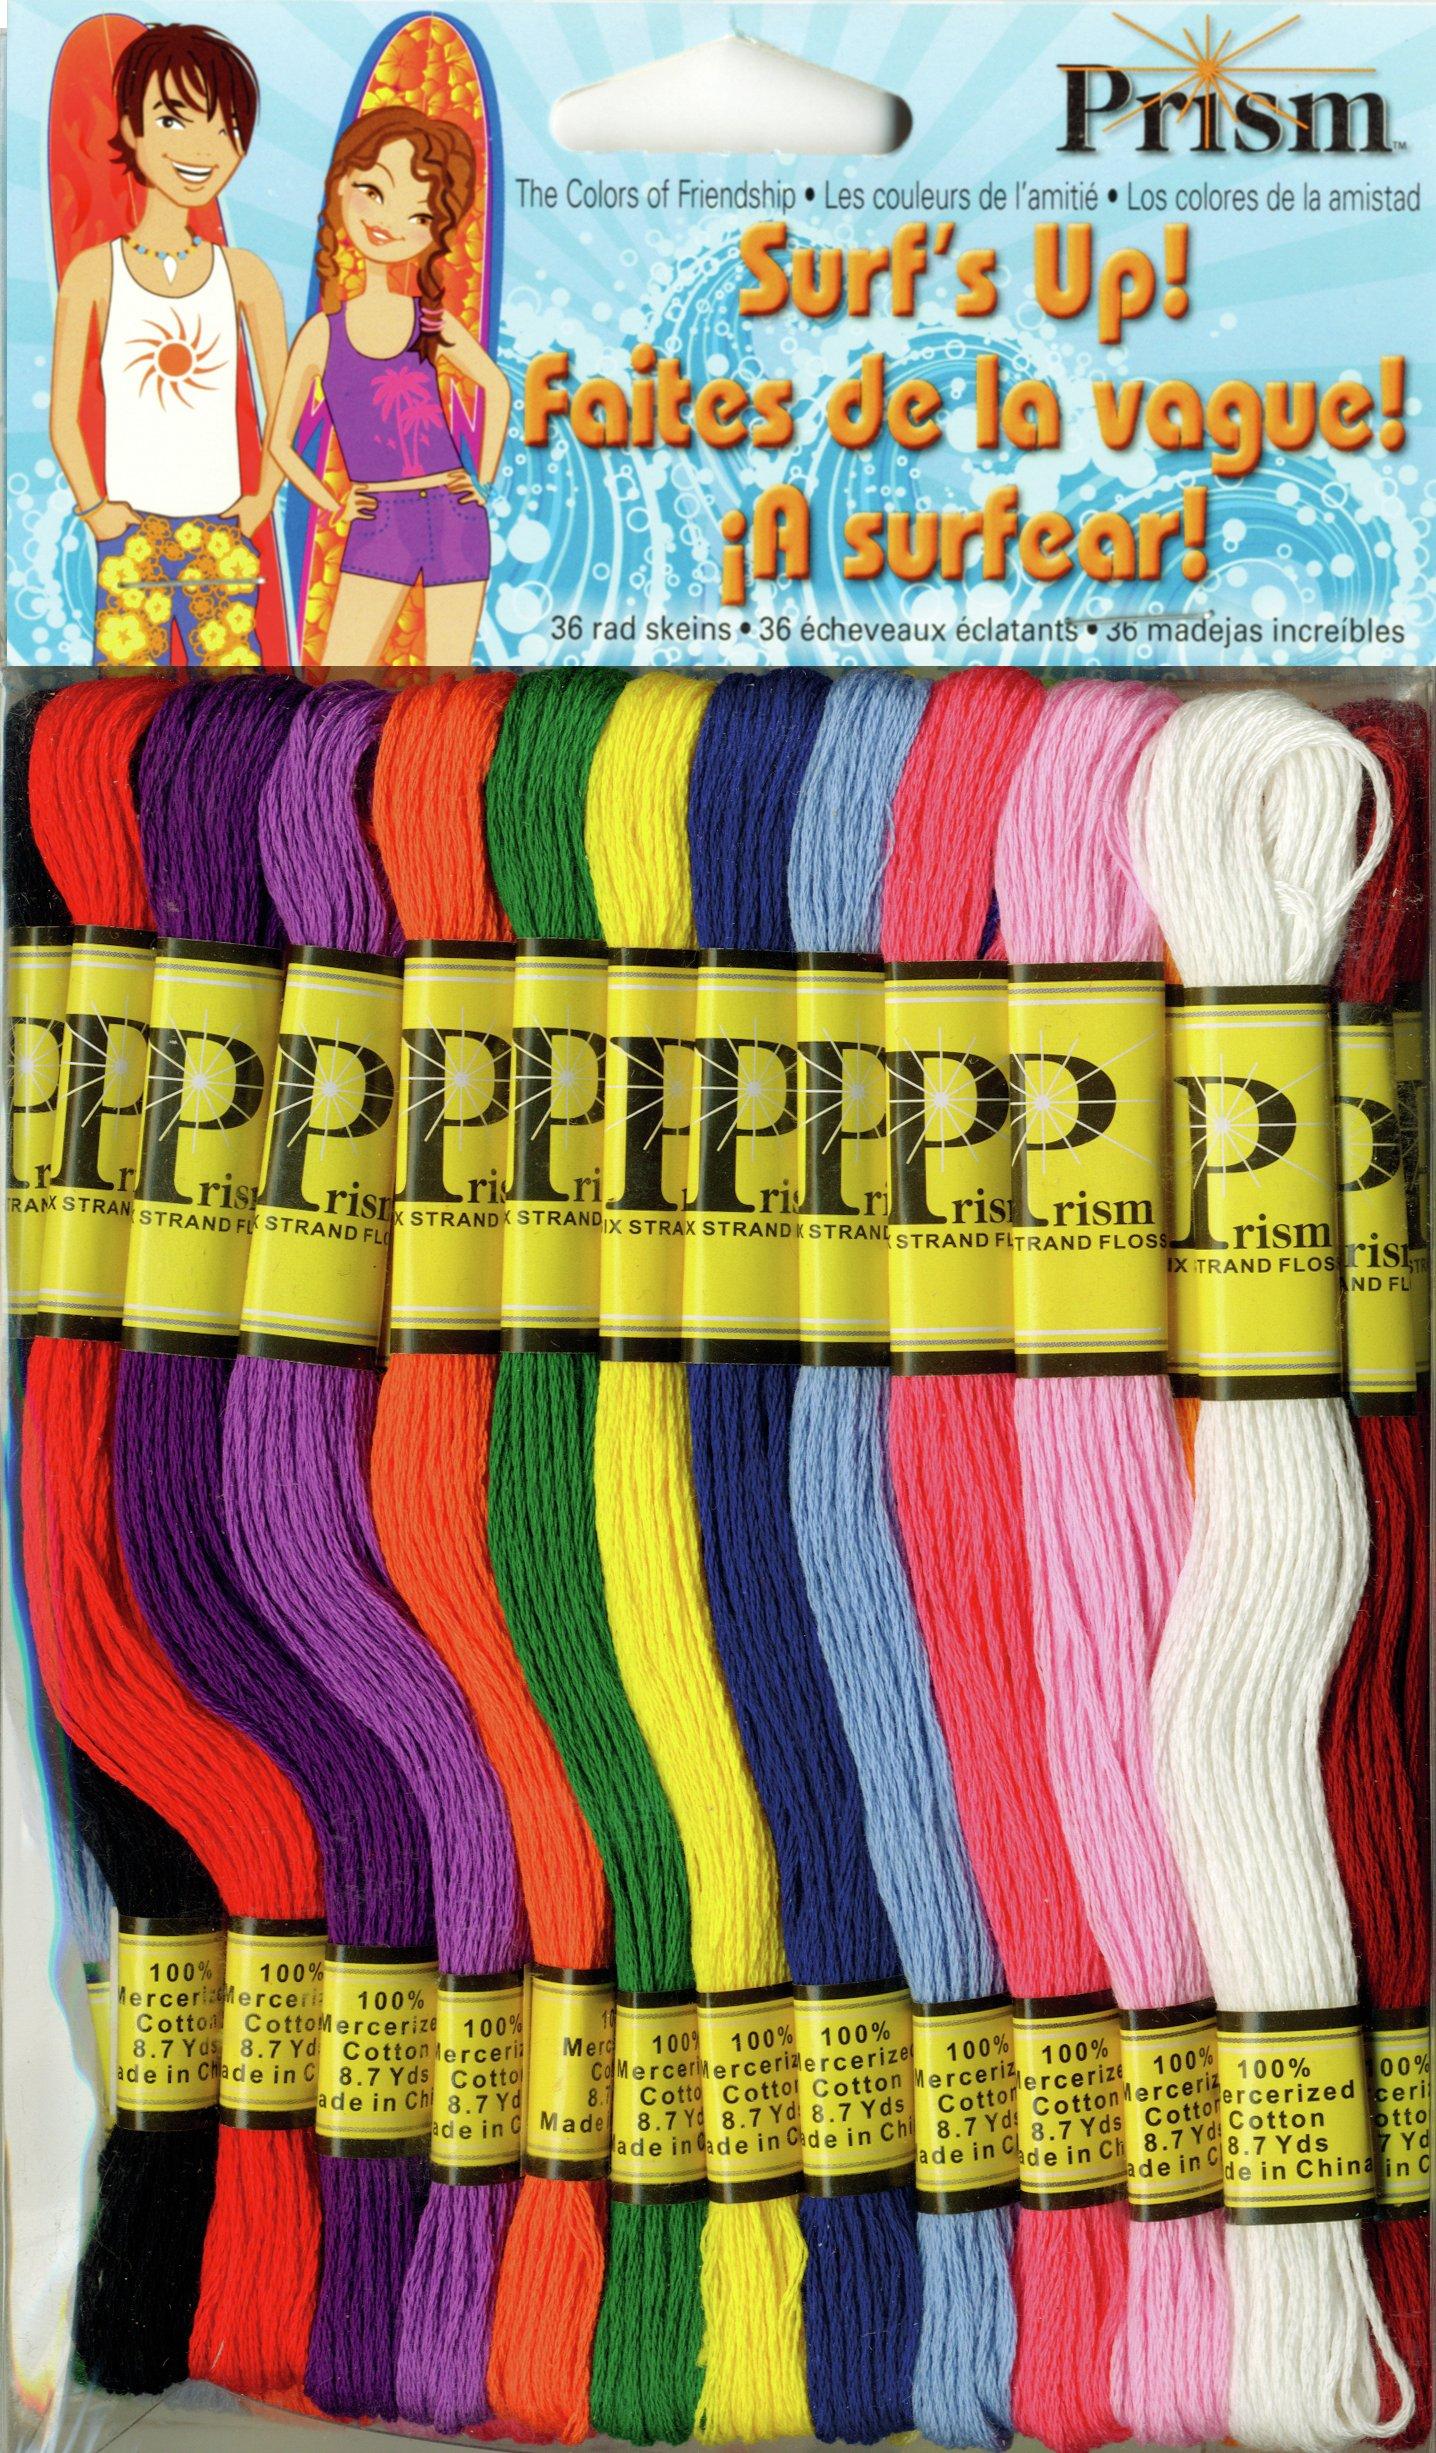 Prism Surfs Up Craft Thread - Medium Pack lowest price